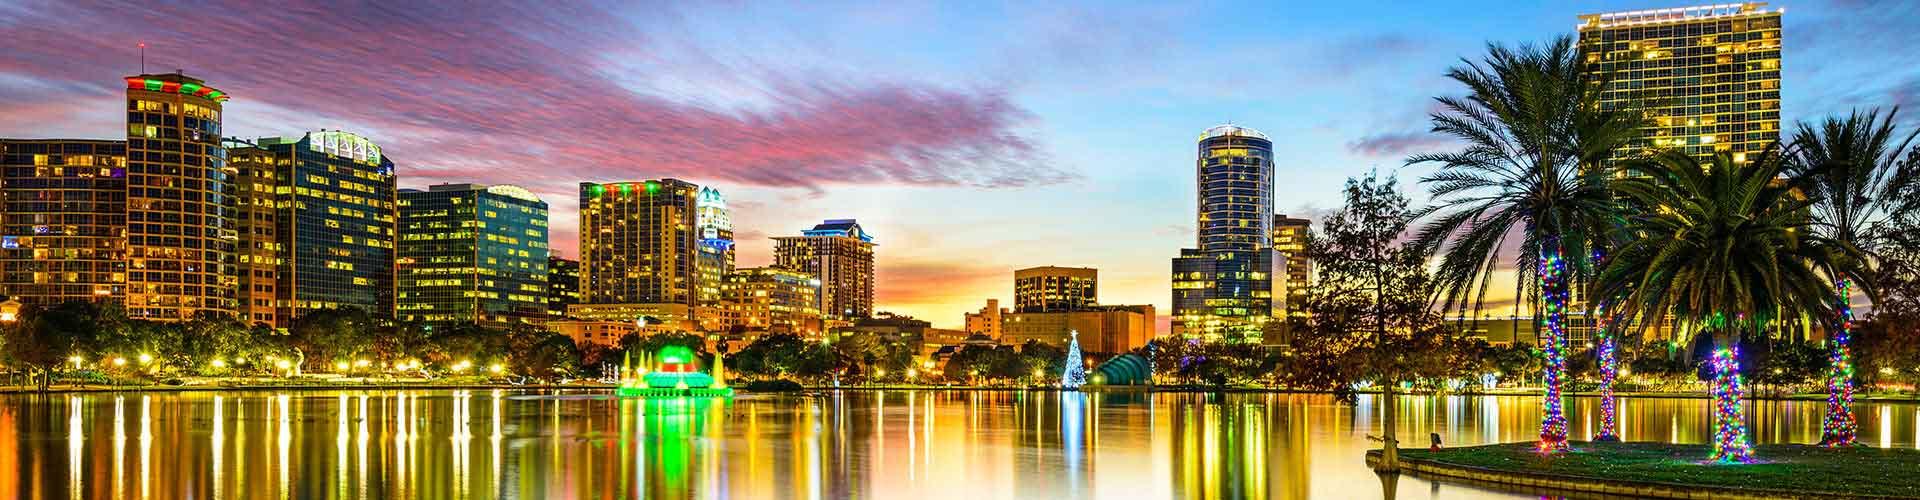 Orlando - Chambres à Orlando. Cartes pour Orlando, photos et commentaires pour chaque chambre à Orlando.